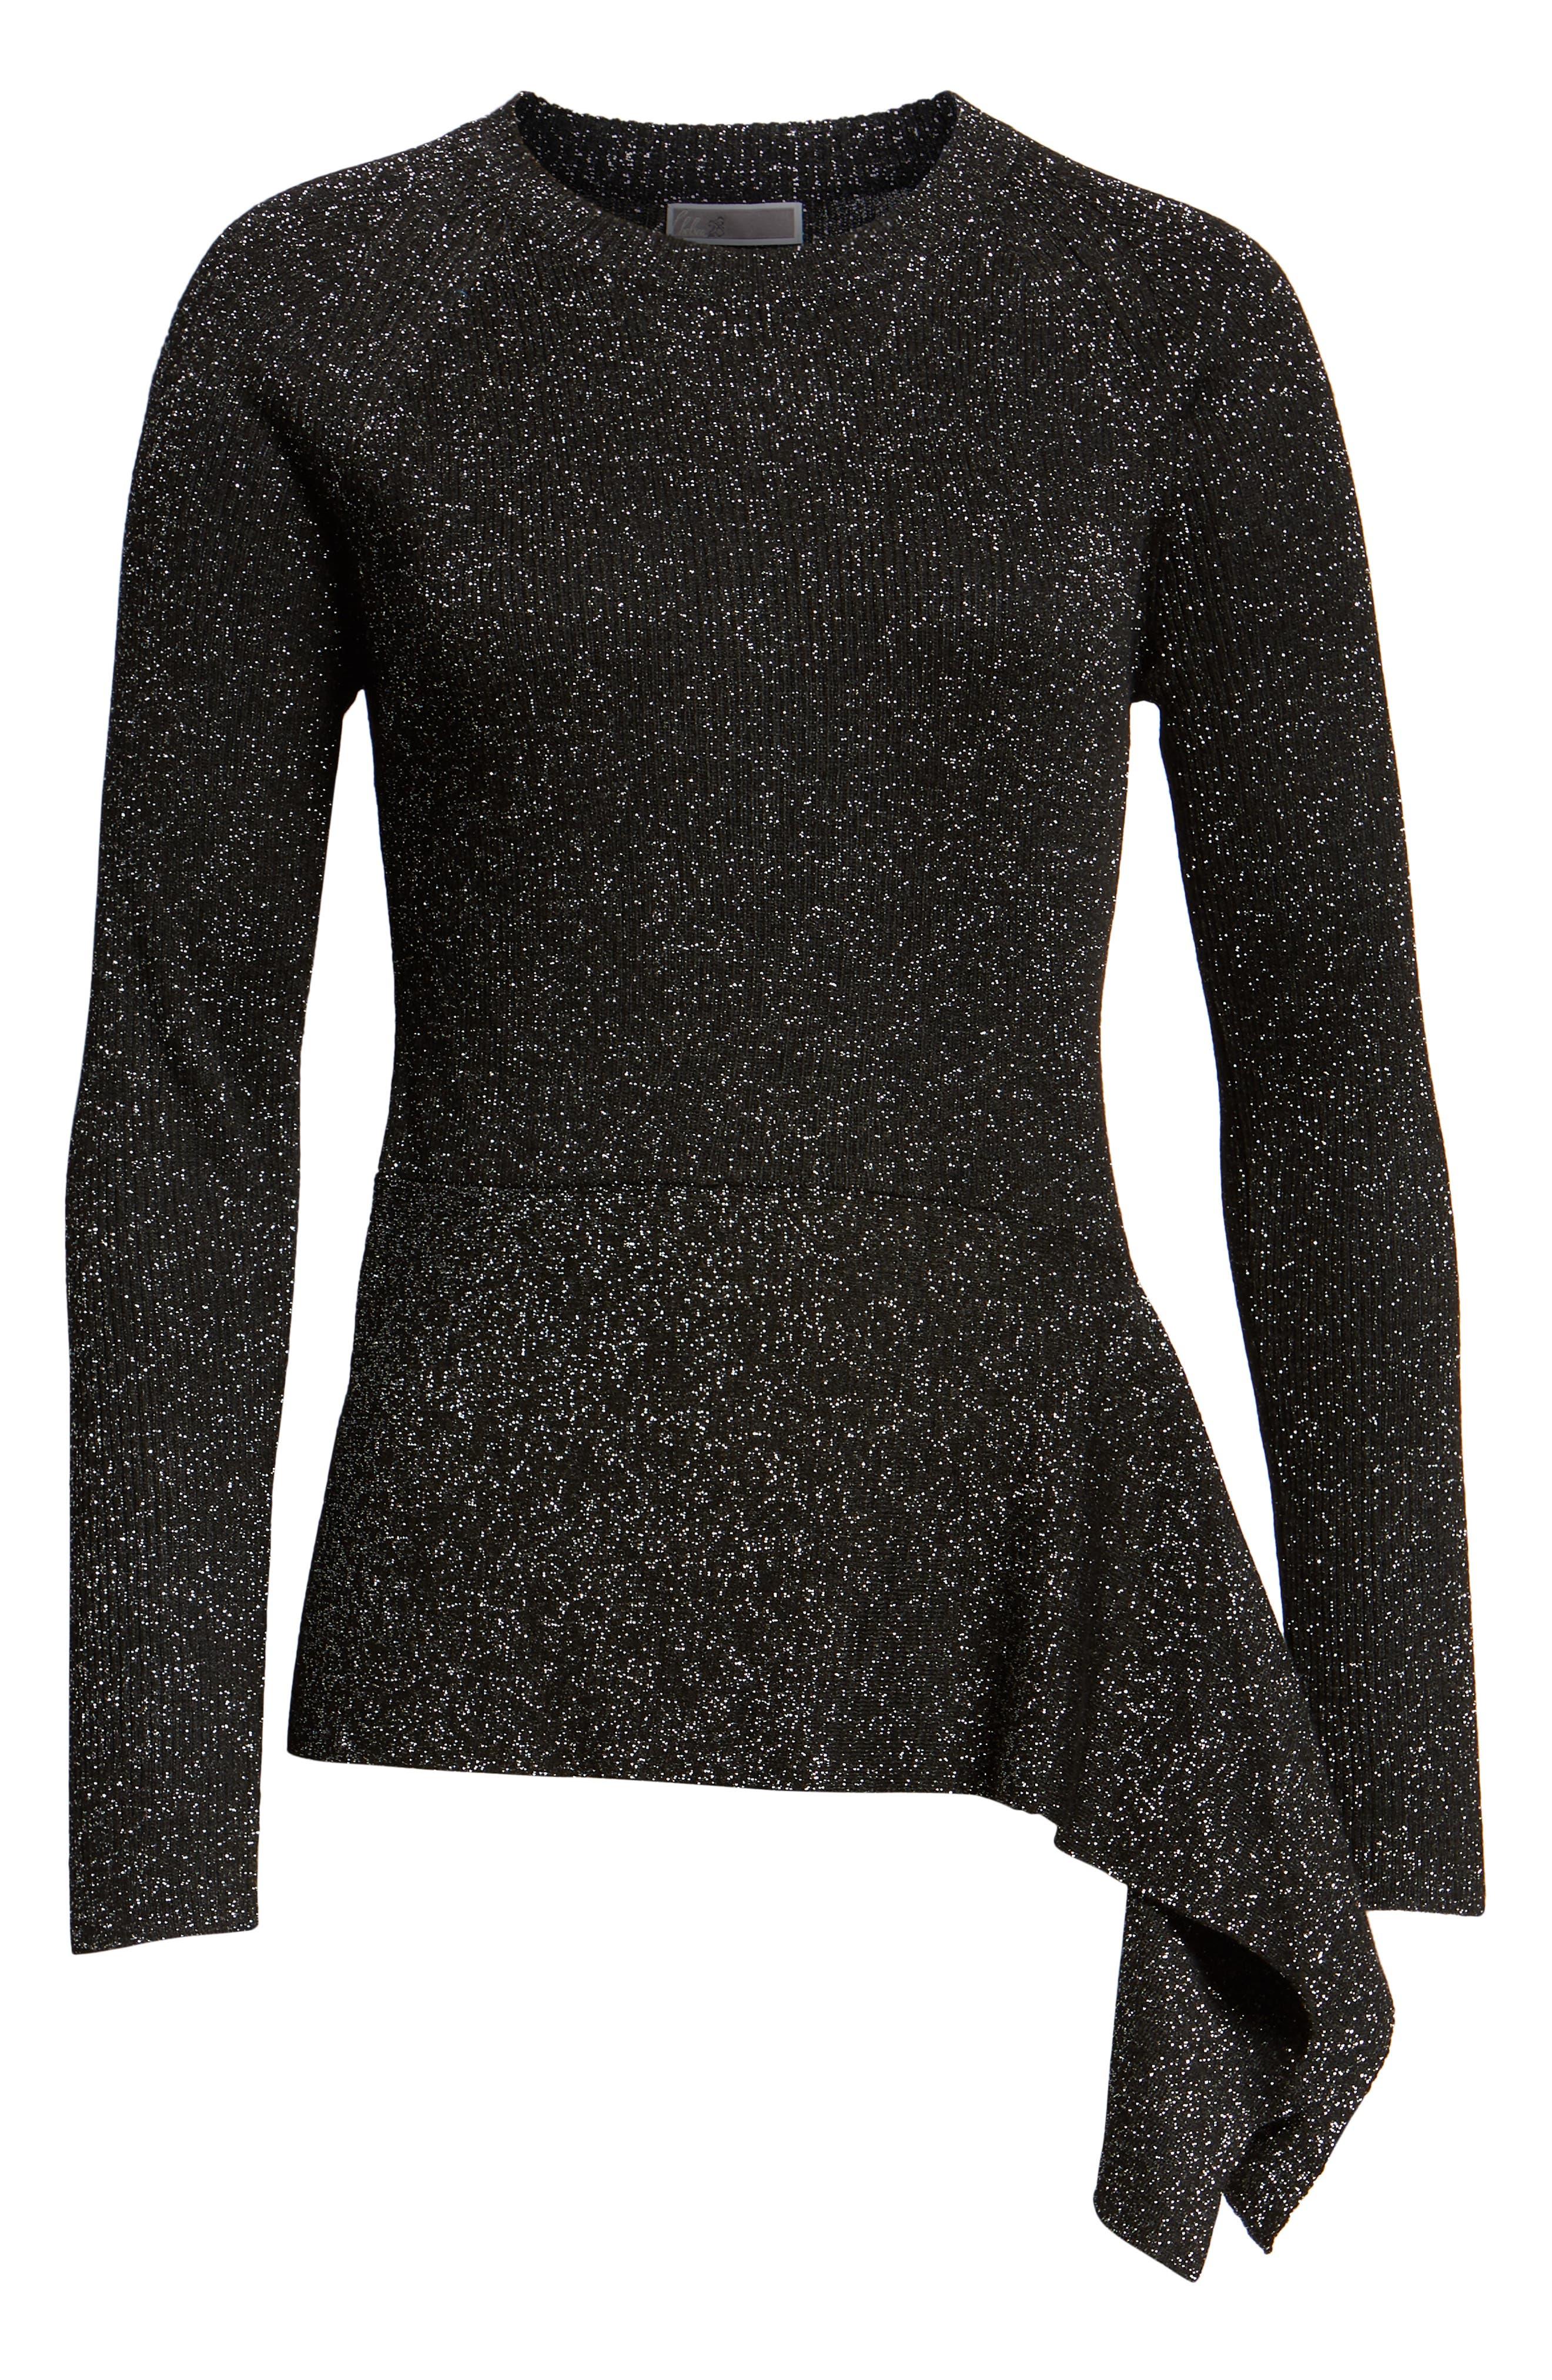 Drape Waist Sweater,                             Alternate thumbnail 6, color,                             BLACK- SILVER SPANGLE METALLIC